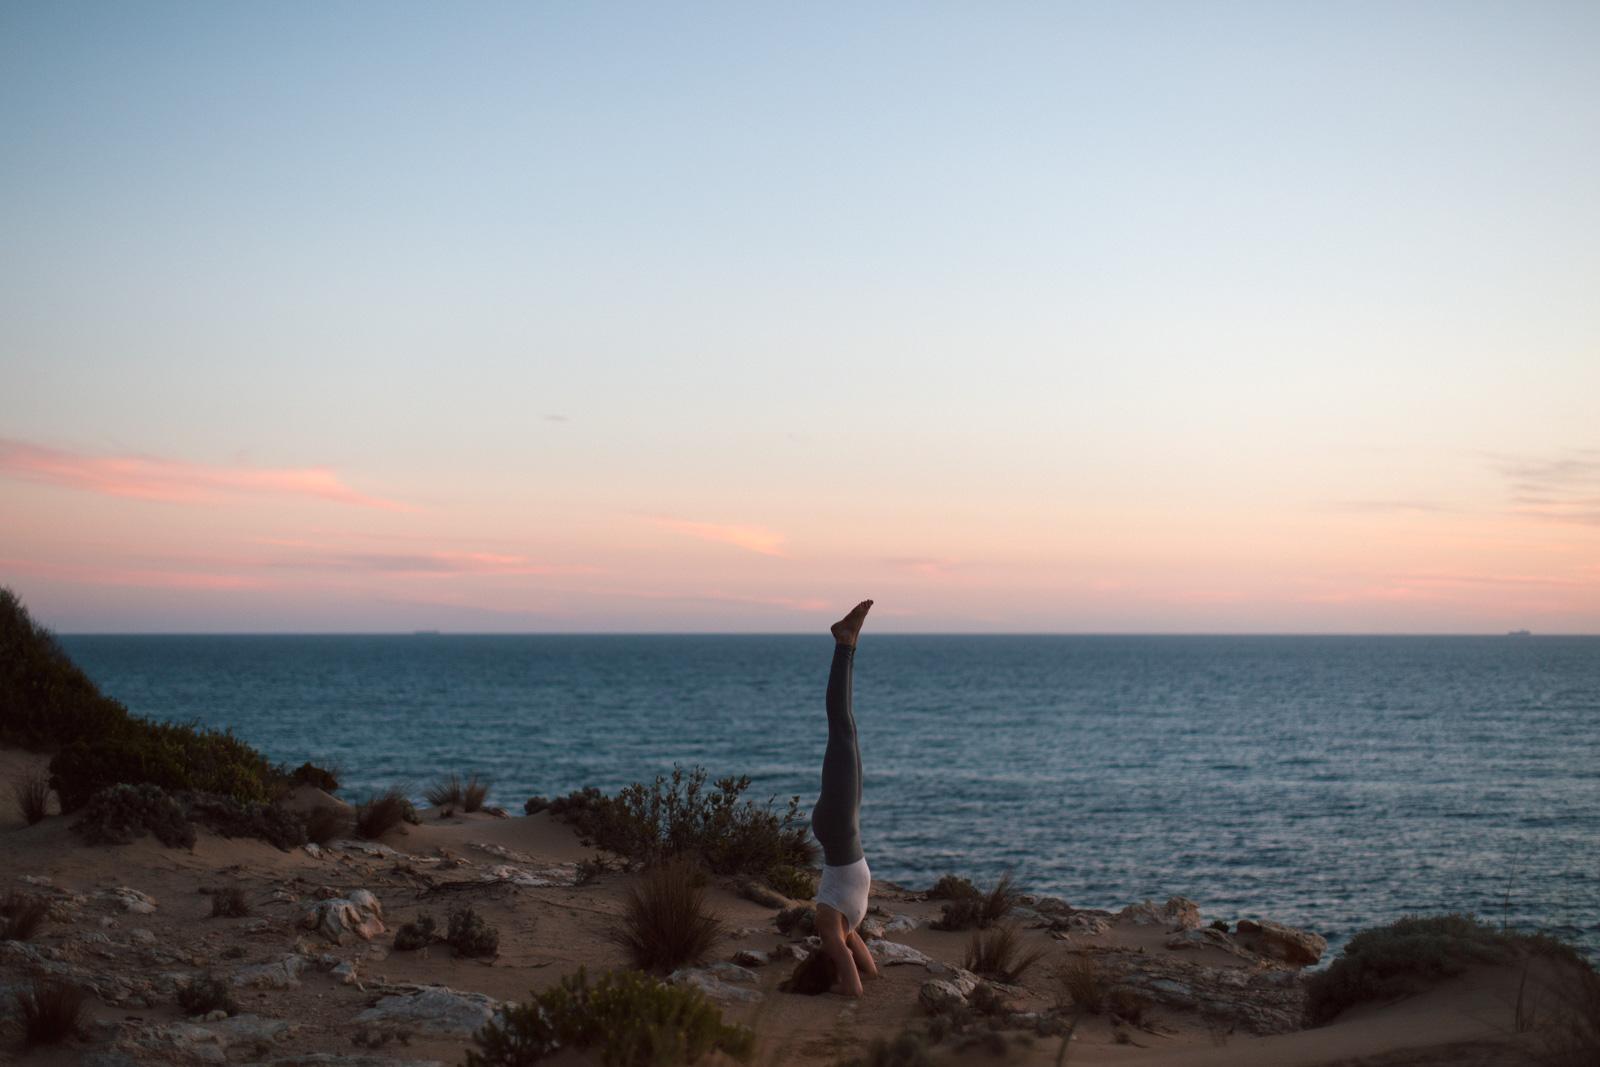 Sian Yoga The Light Collective-Dean Raphael-16.jpg